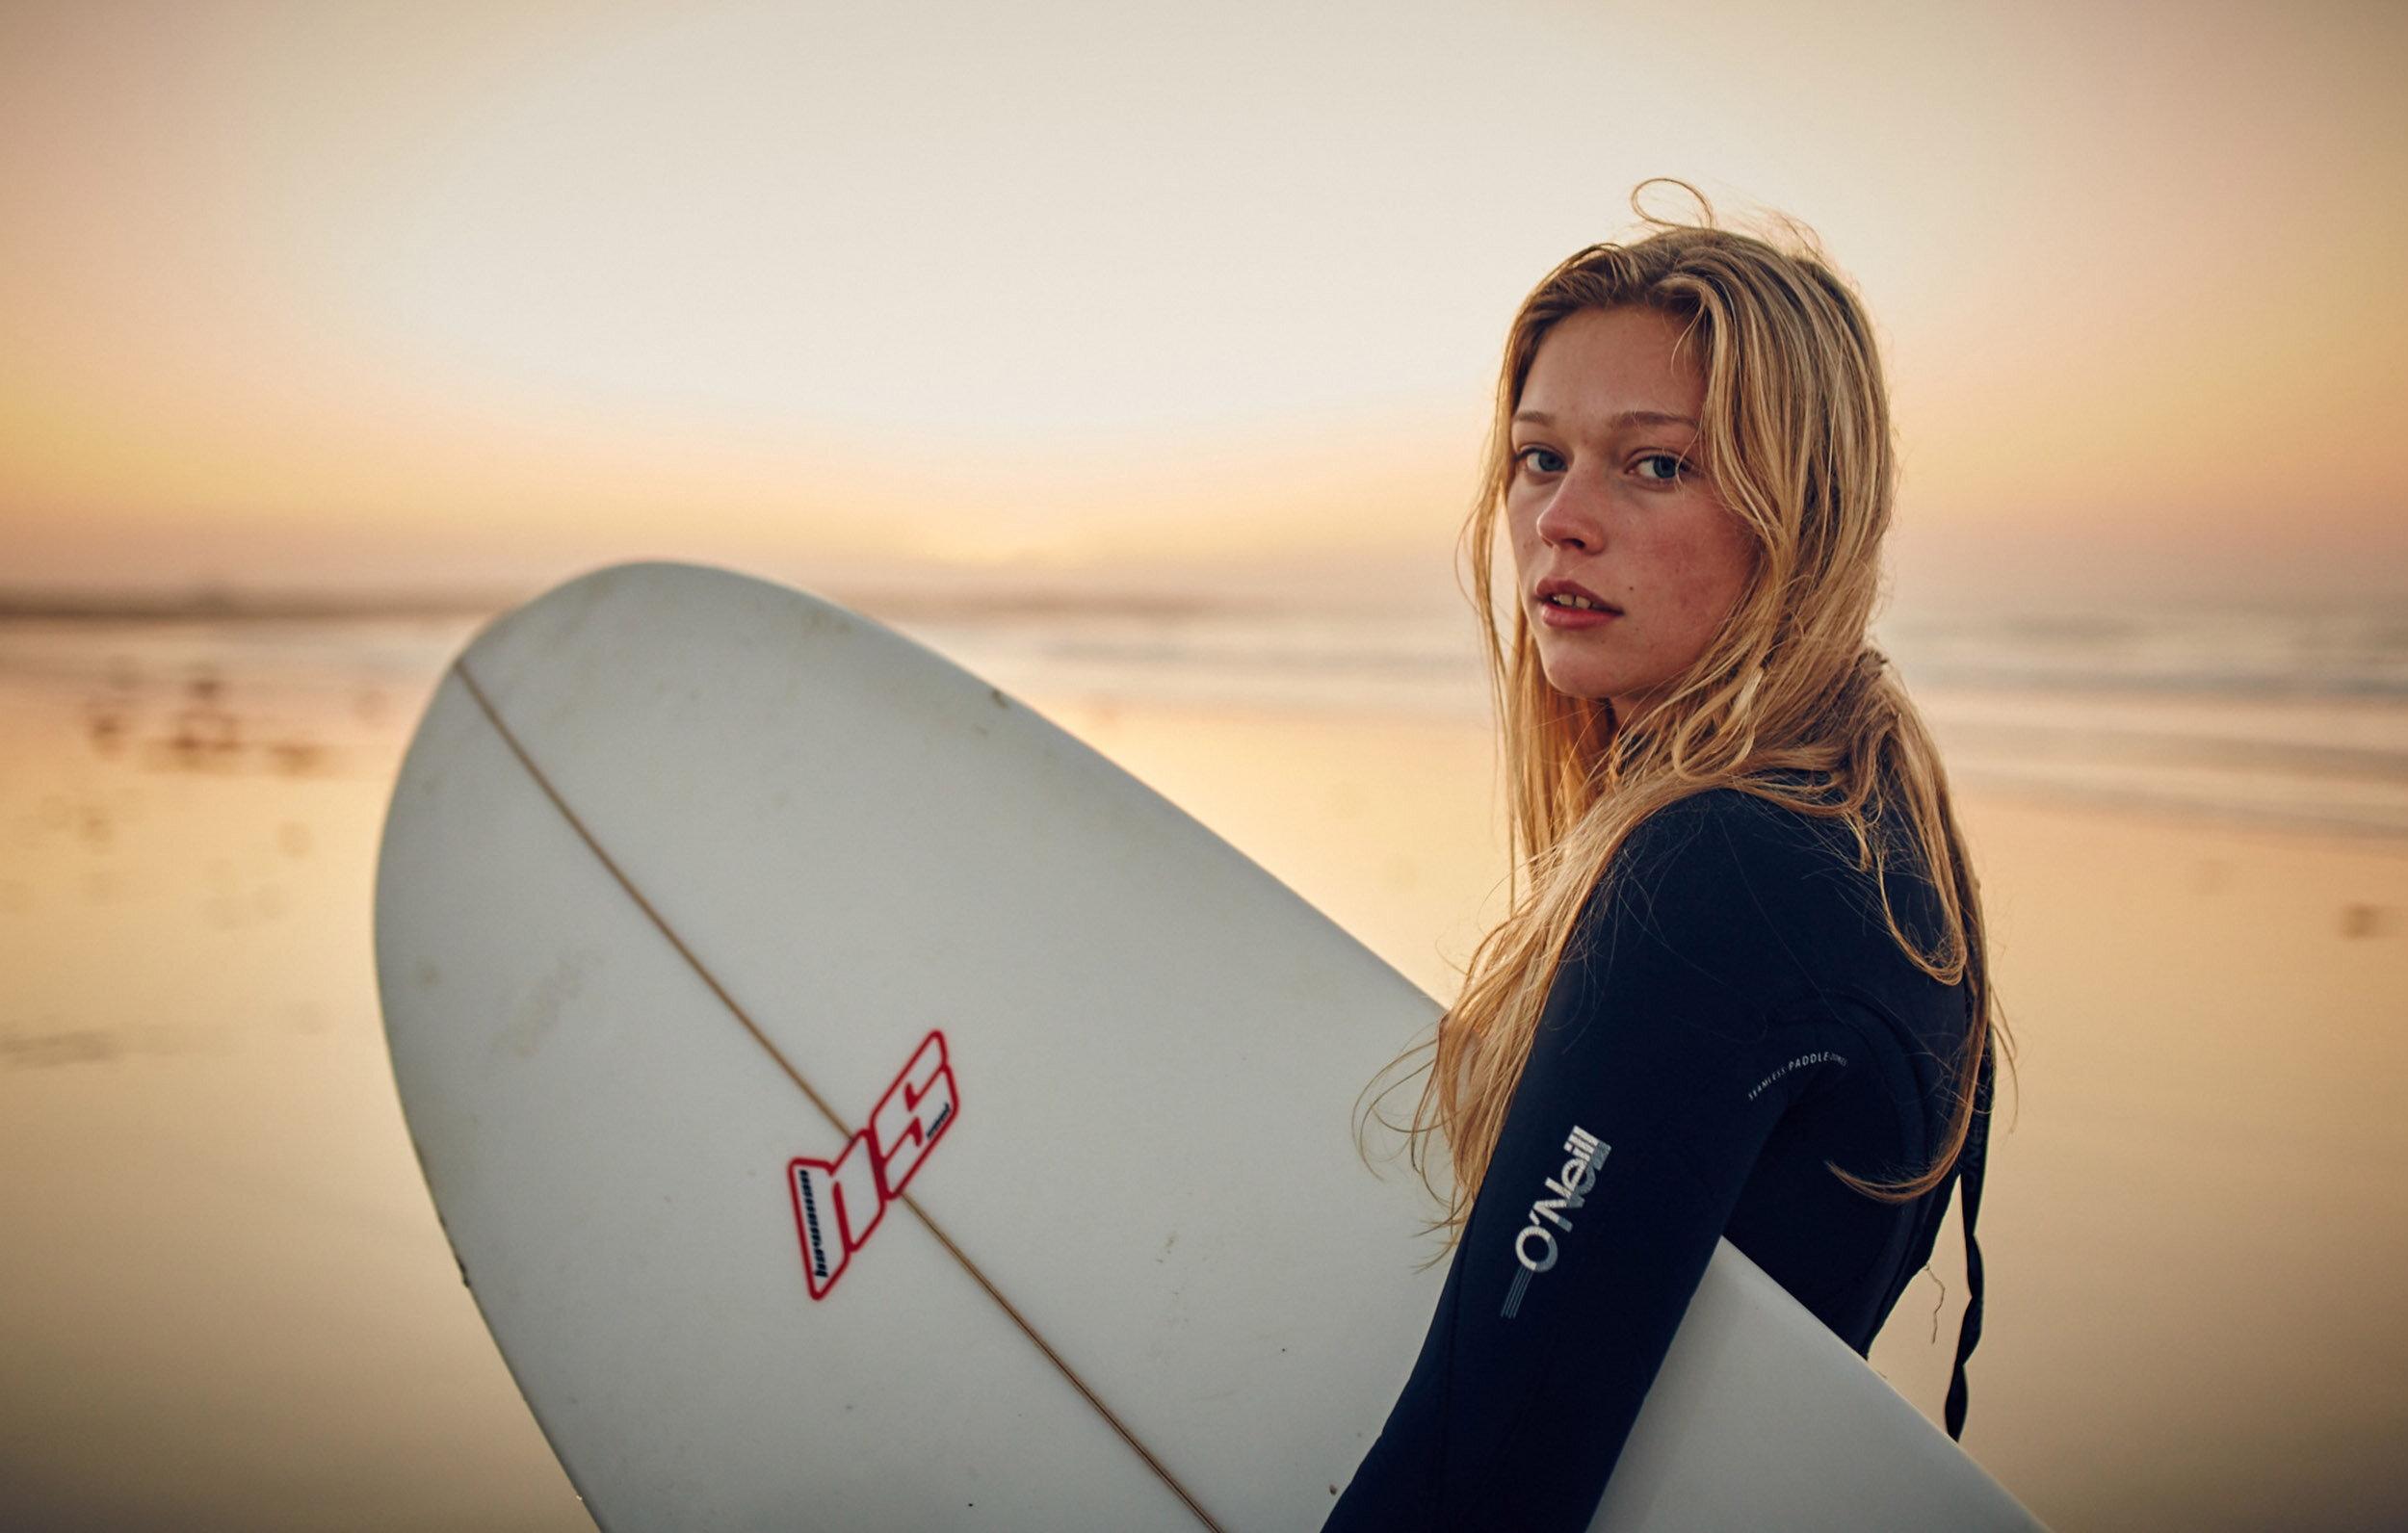 Web slideshow - Surfing Girl Glancing.jpg